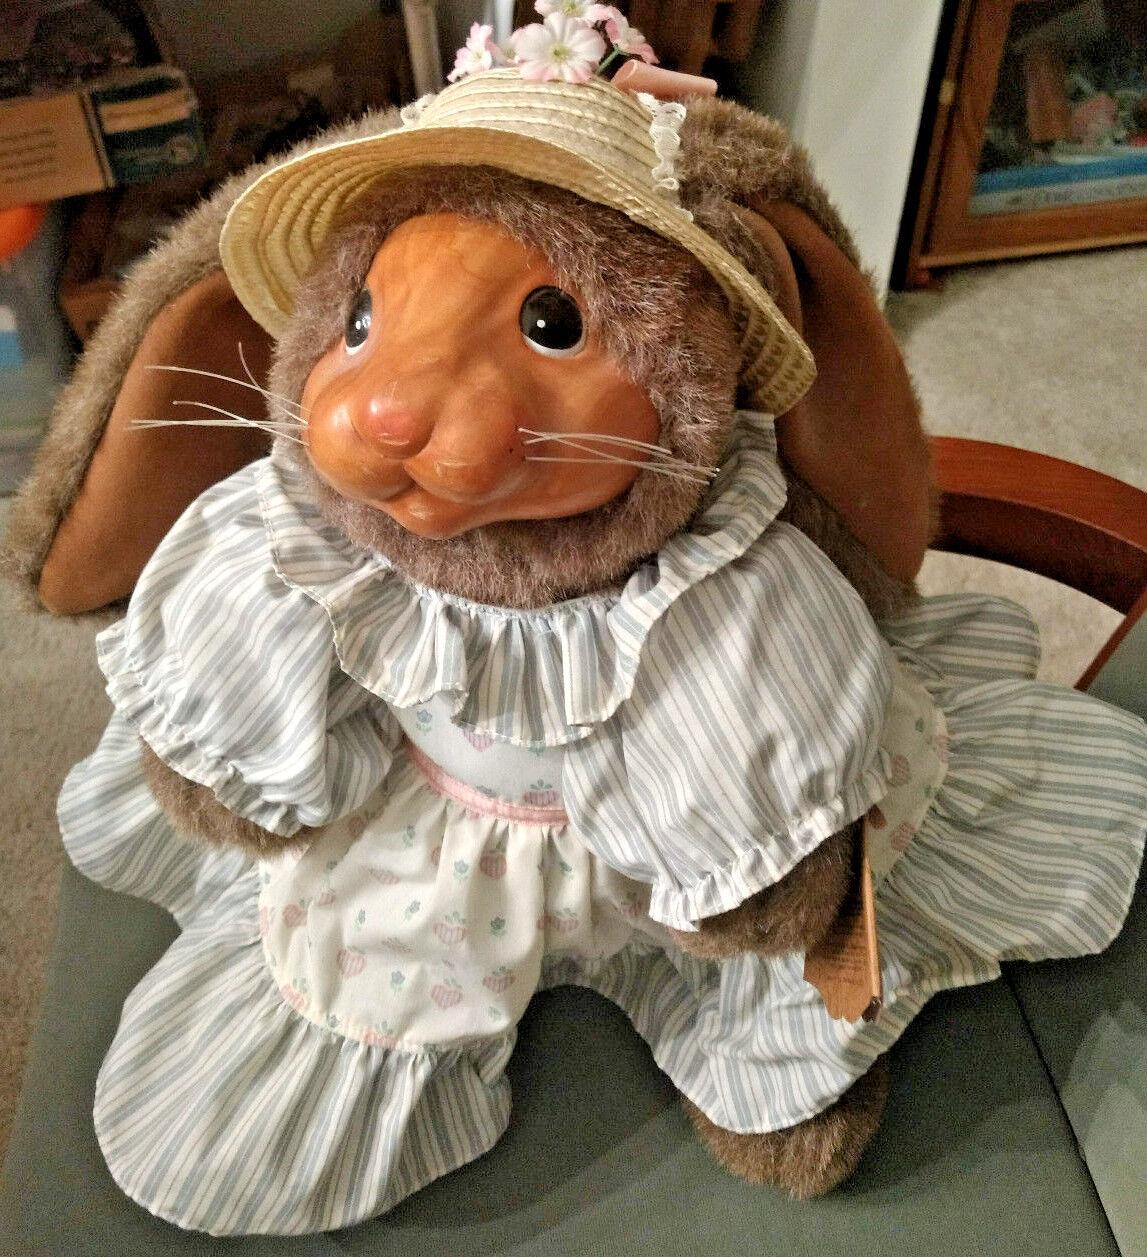 Robert Raikes Bear Jill Bunny Rabbit 20266  No 4565 of 5000  RARE